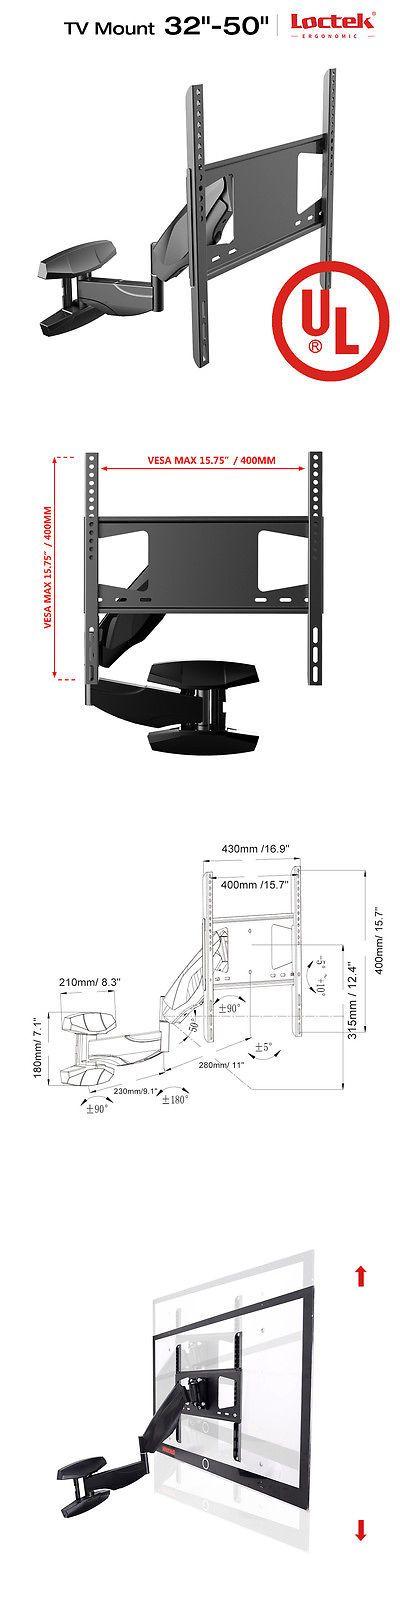 TV Mounts and Brackets: Loctek S1 Articulating Full Motion Swivel Tv Wall Mount Bracket 32 37 40 42 50 -> BUY IT NOW ONLY: $72.99 on eBay!